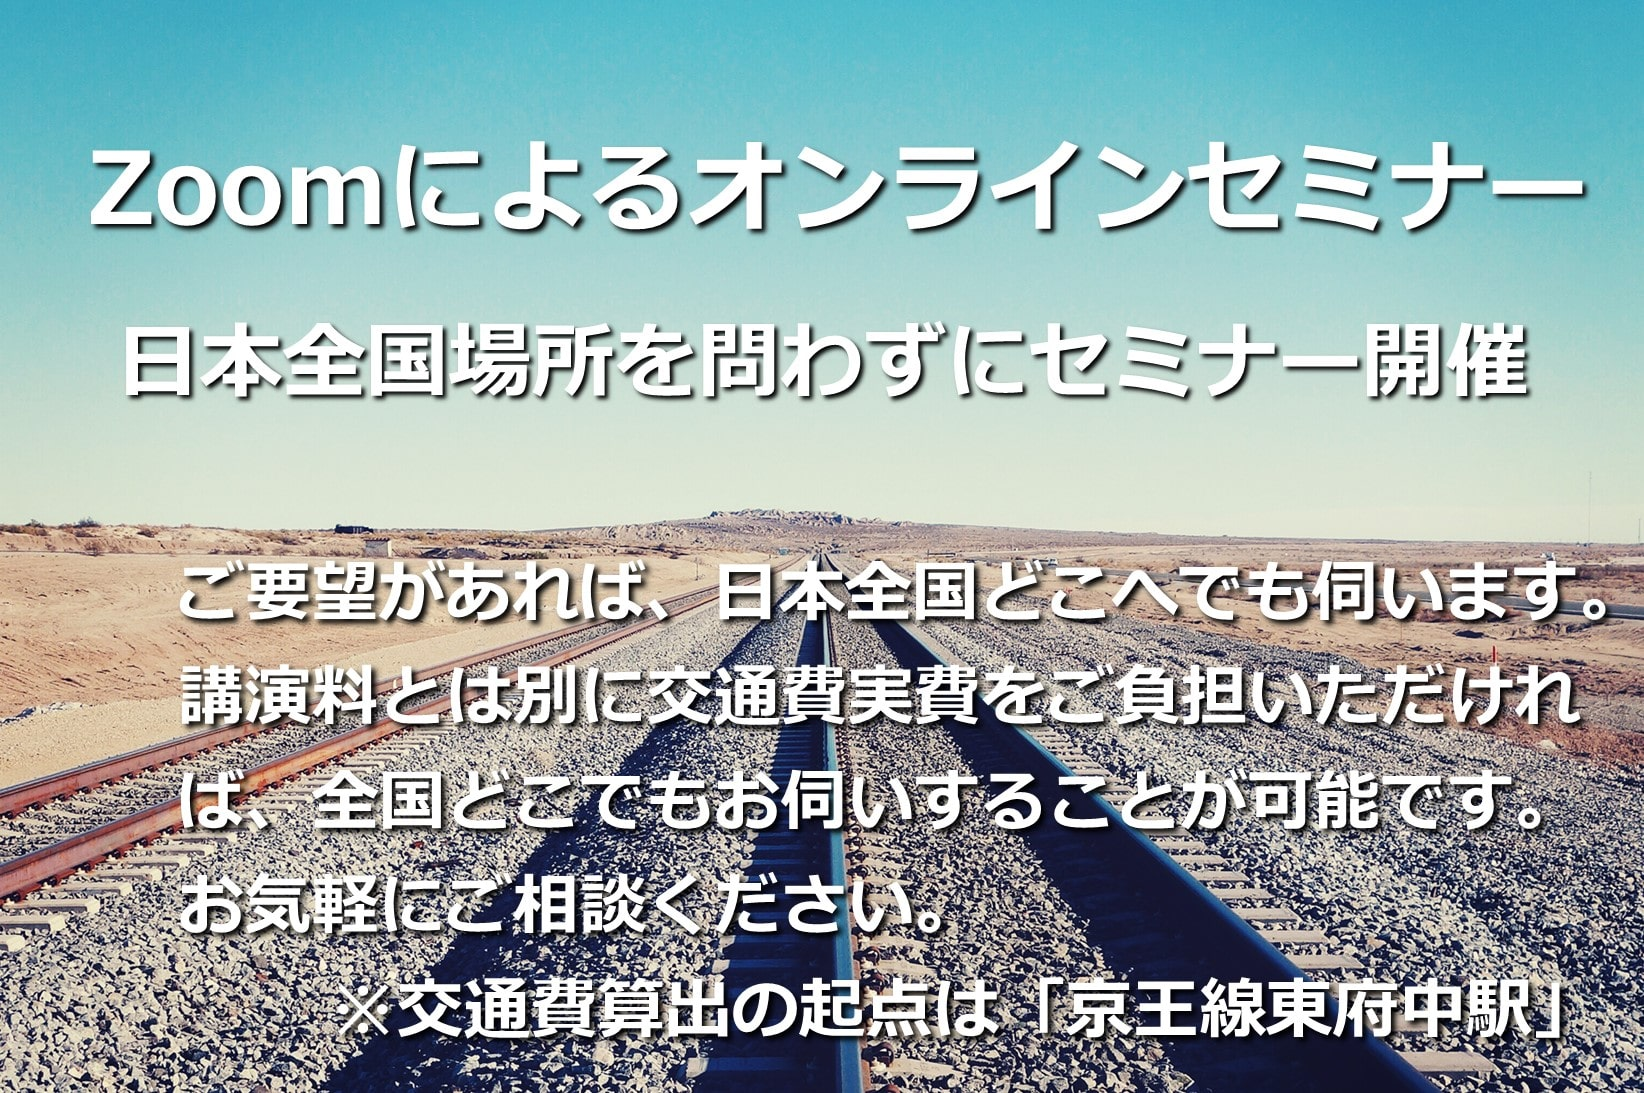 Zoomによるオンラインセミナー 日本全国場所を問わずにセミナー開催 ご要望があれば、日本全国どこへでも伺います。講演料とは別に交通費実費をご負担いただければ、全国どこでもお伺いすることが可能です。お気軽にご相談ください。 ※交通費算出の起点は「京王線東府中駅」